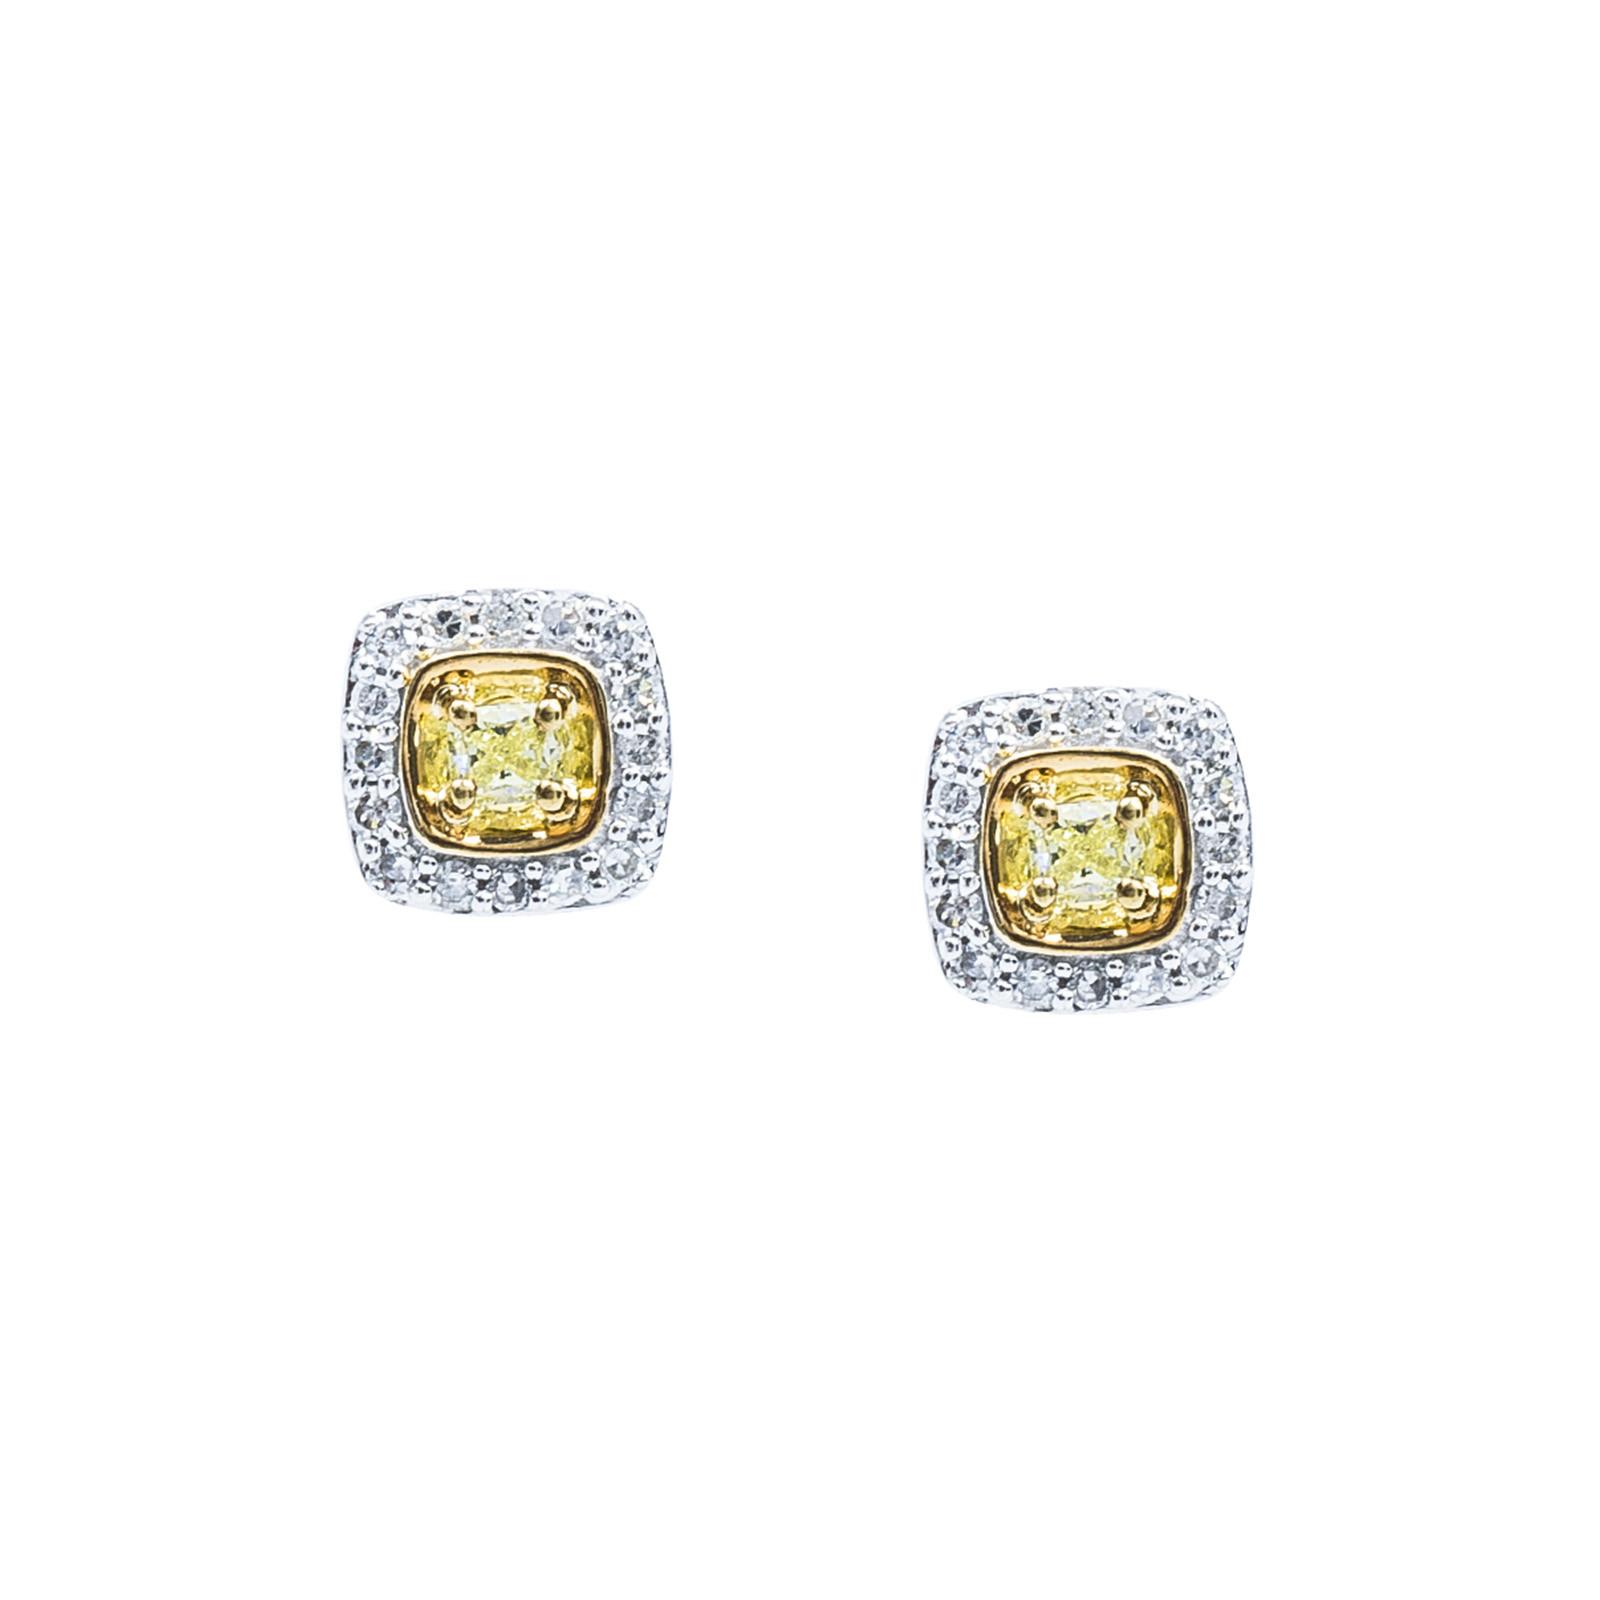 New 0.32 CTW Yellow & White Diamond Stud Earrings